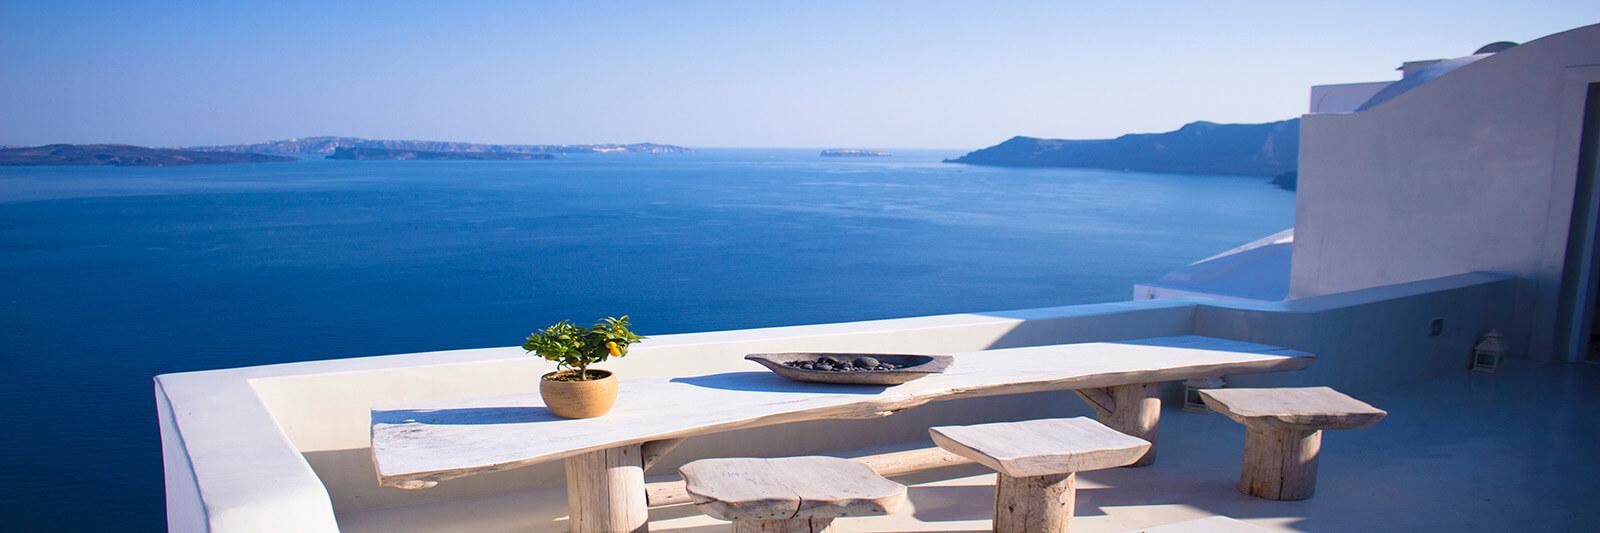 Breathtaking view in Oia, Greece